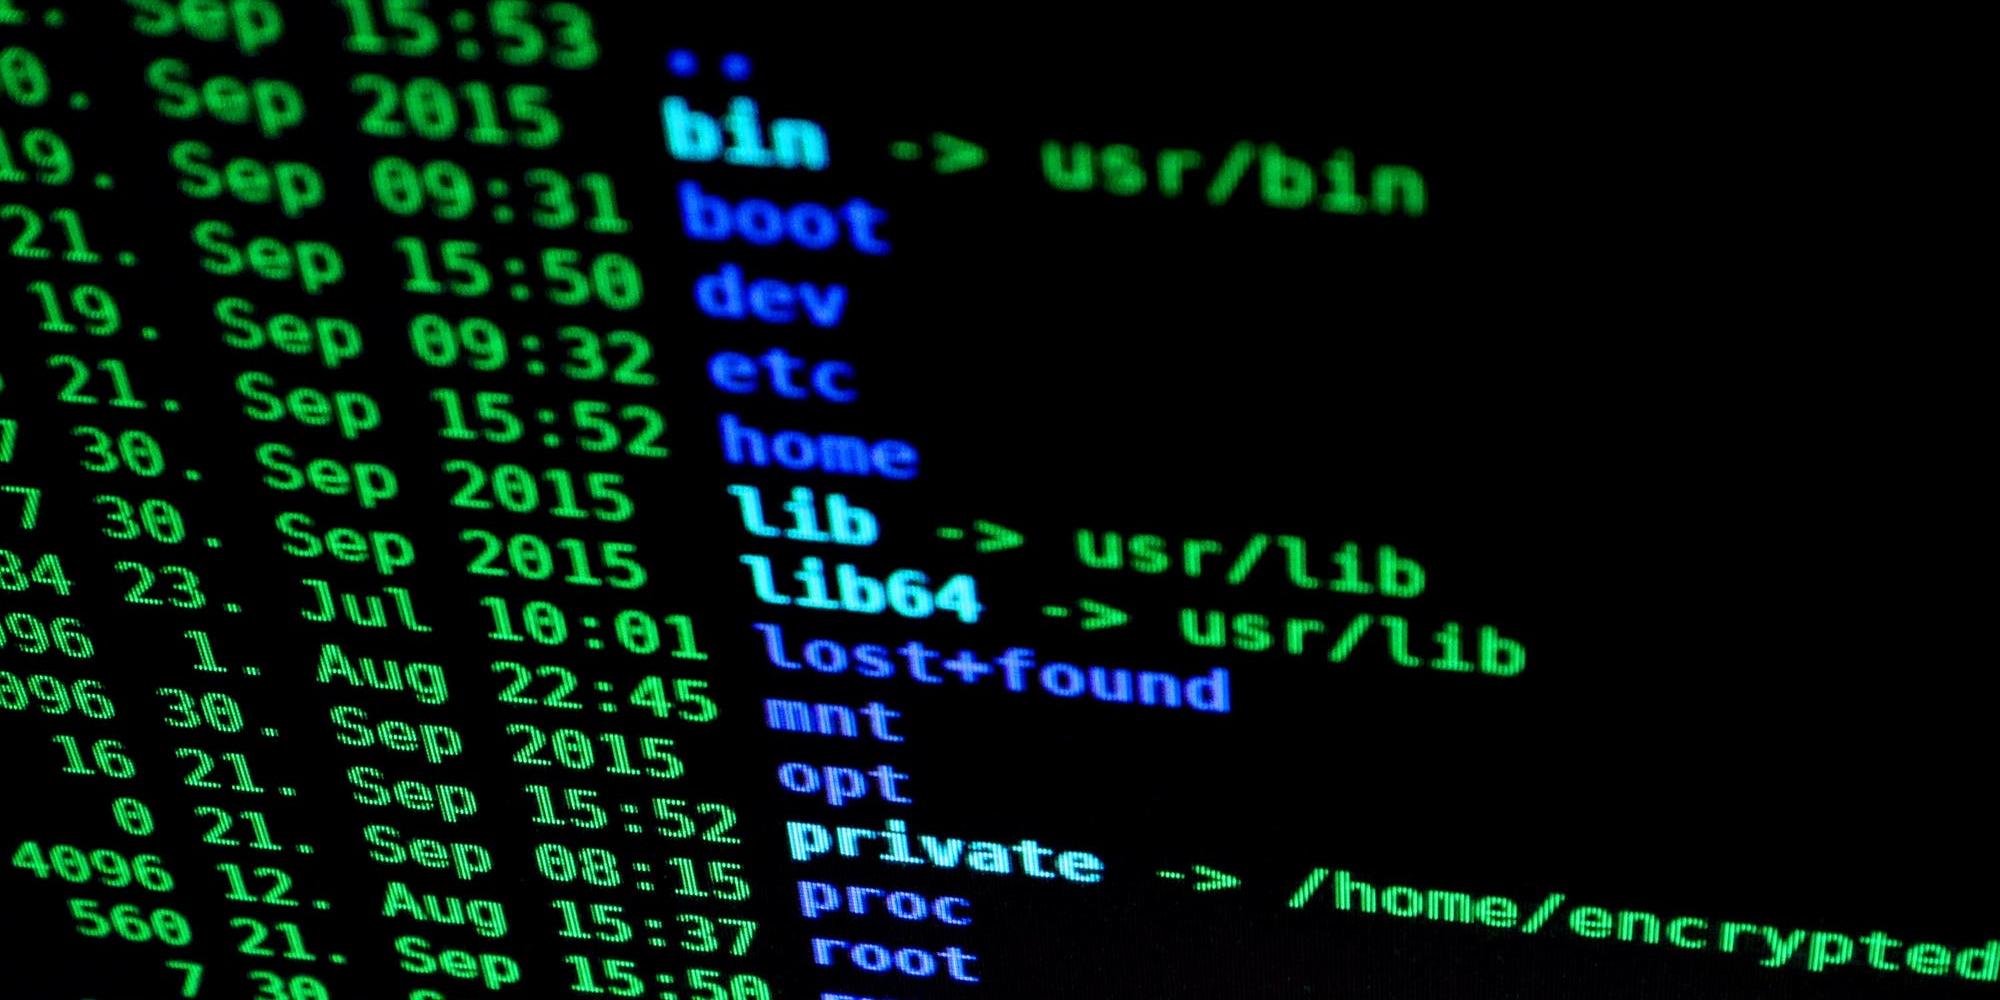 How to Install an SSH Server on CentOS 7